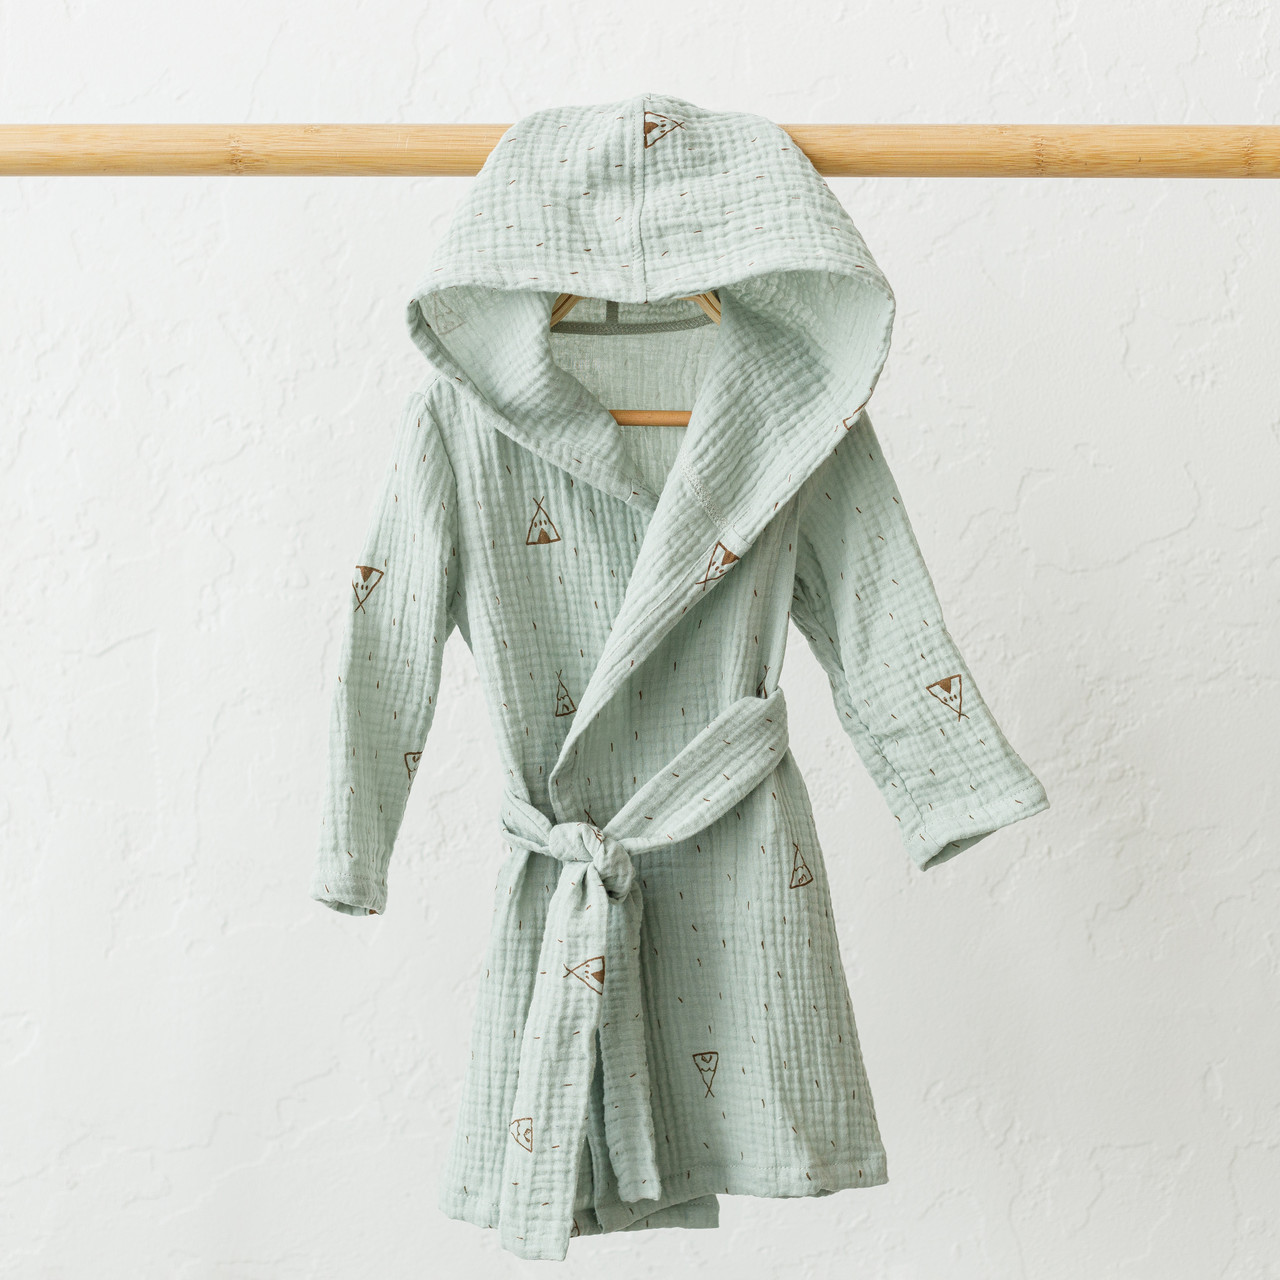 Муслиновый халат Soft, Вігвами